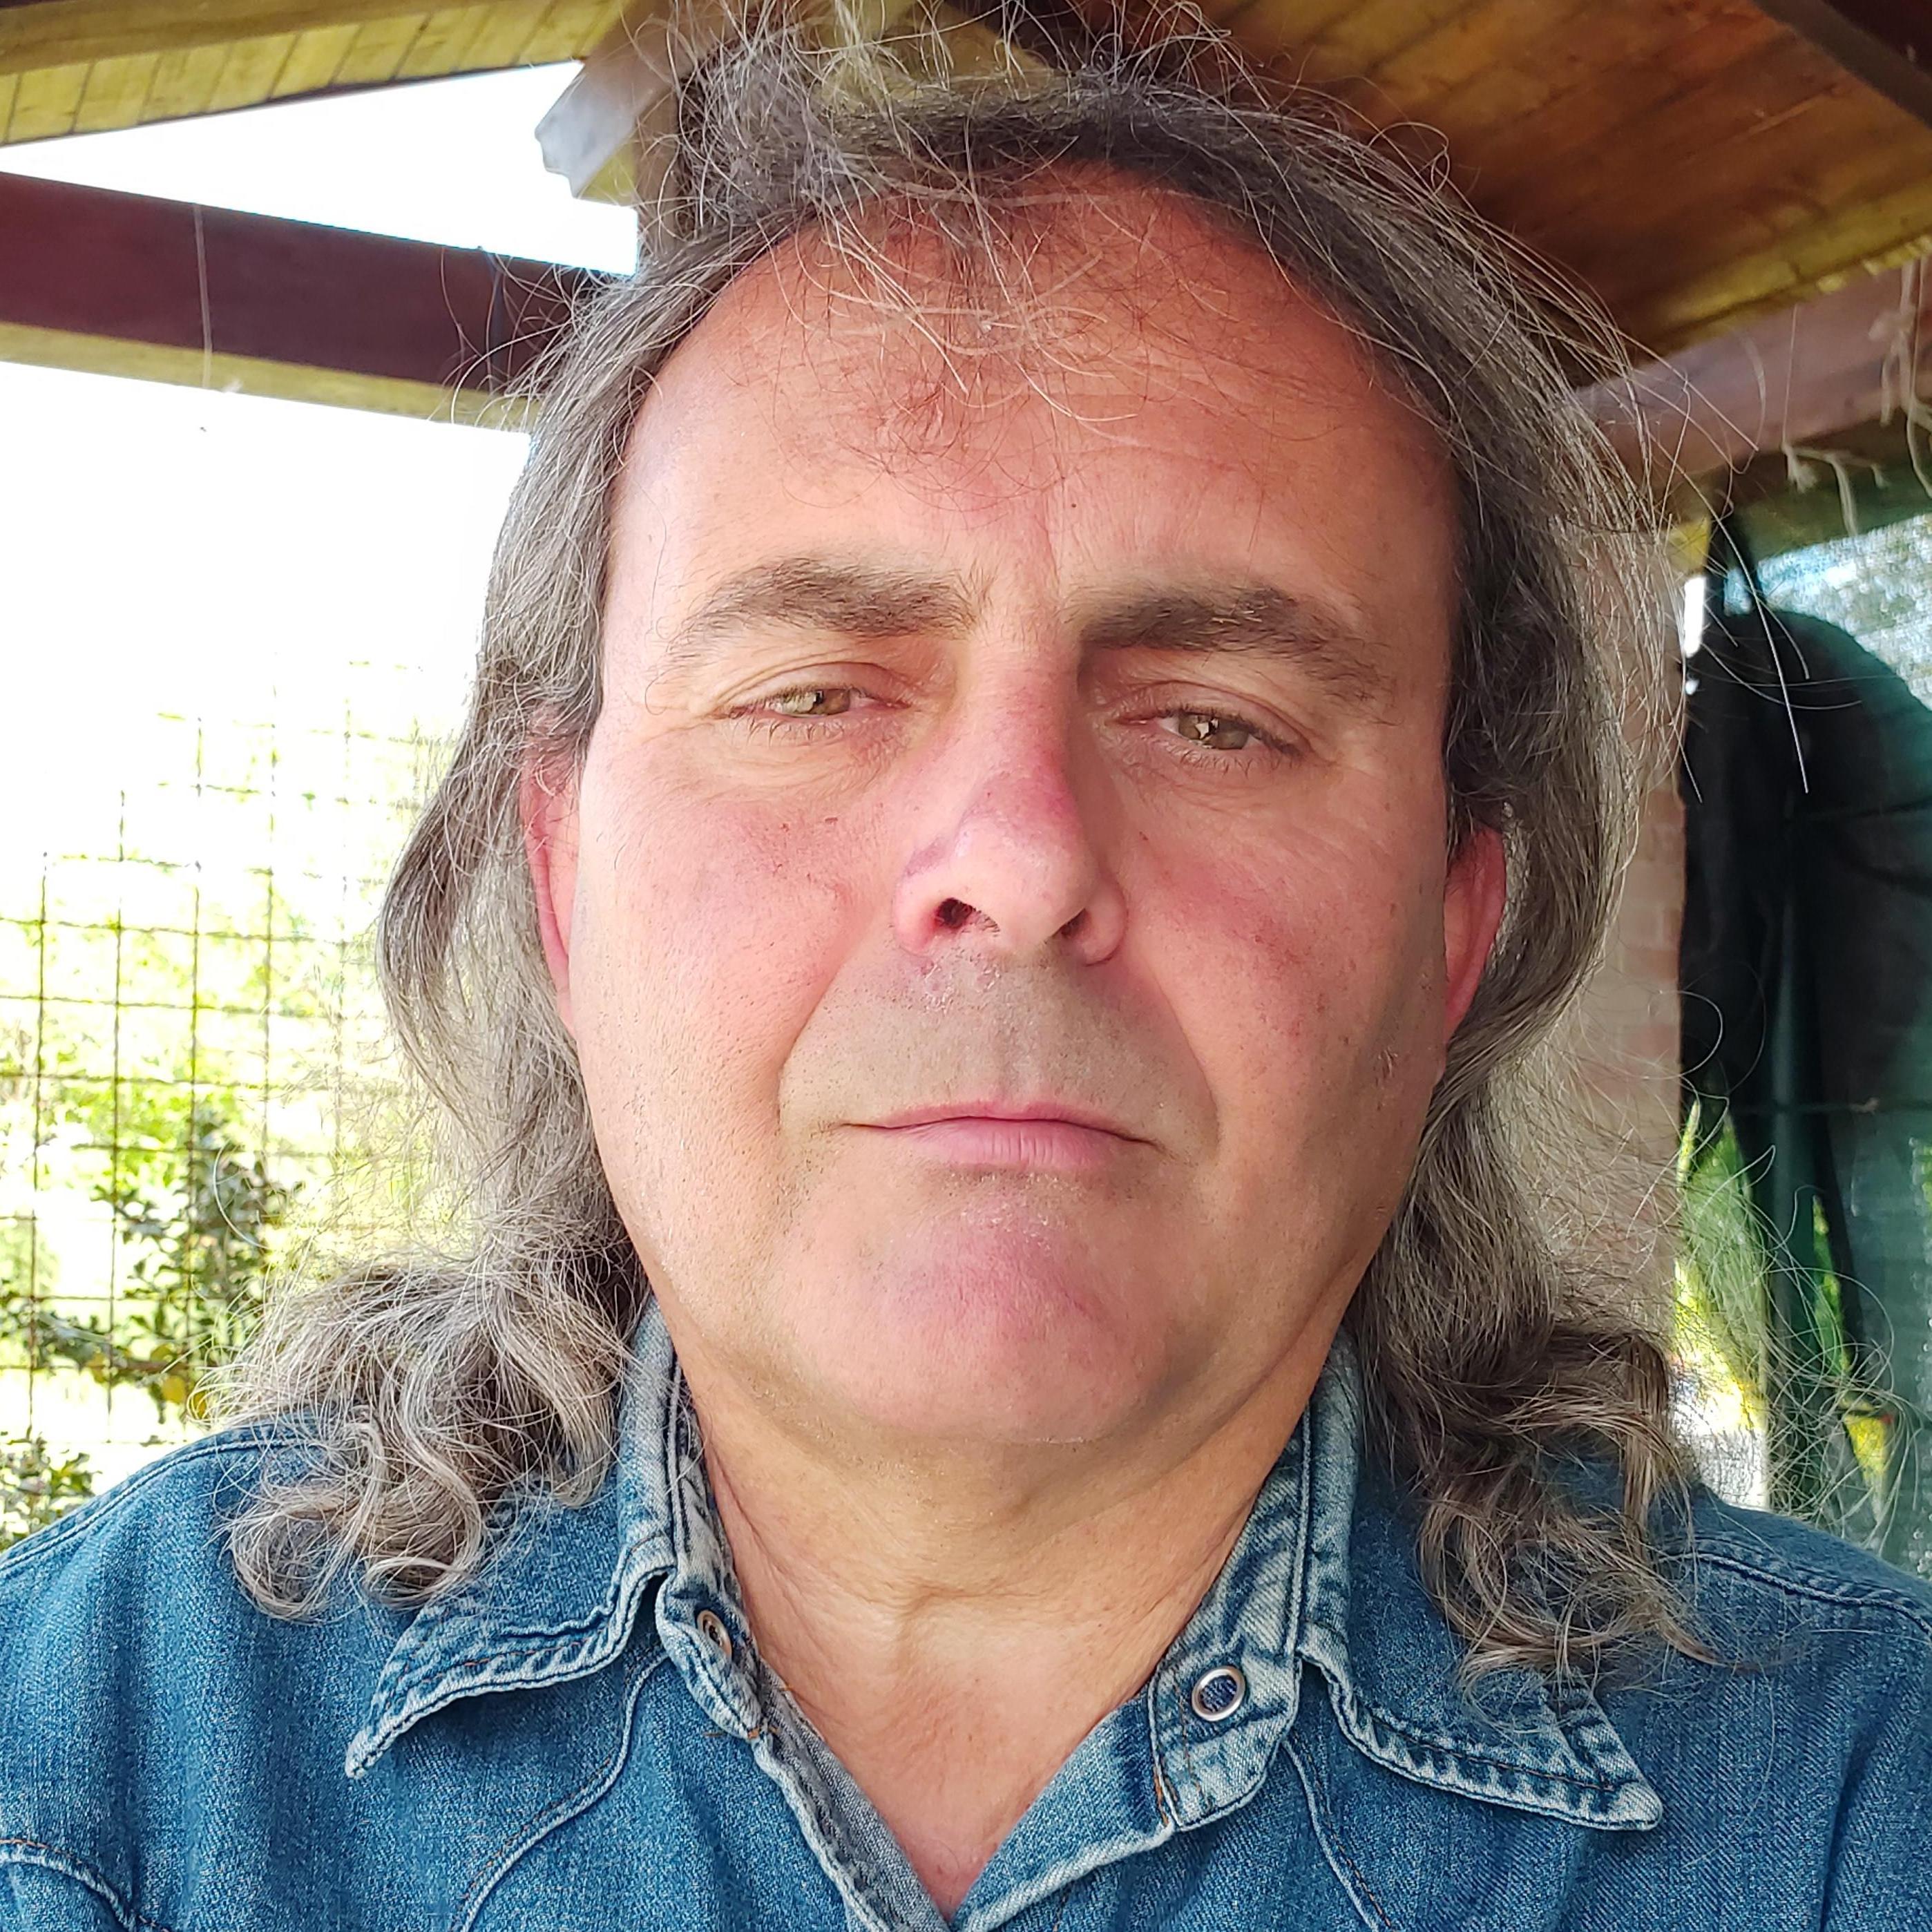 ANTONIO SIMEONE